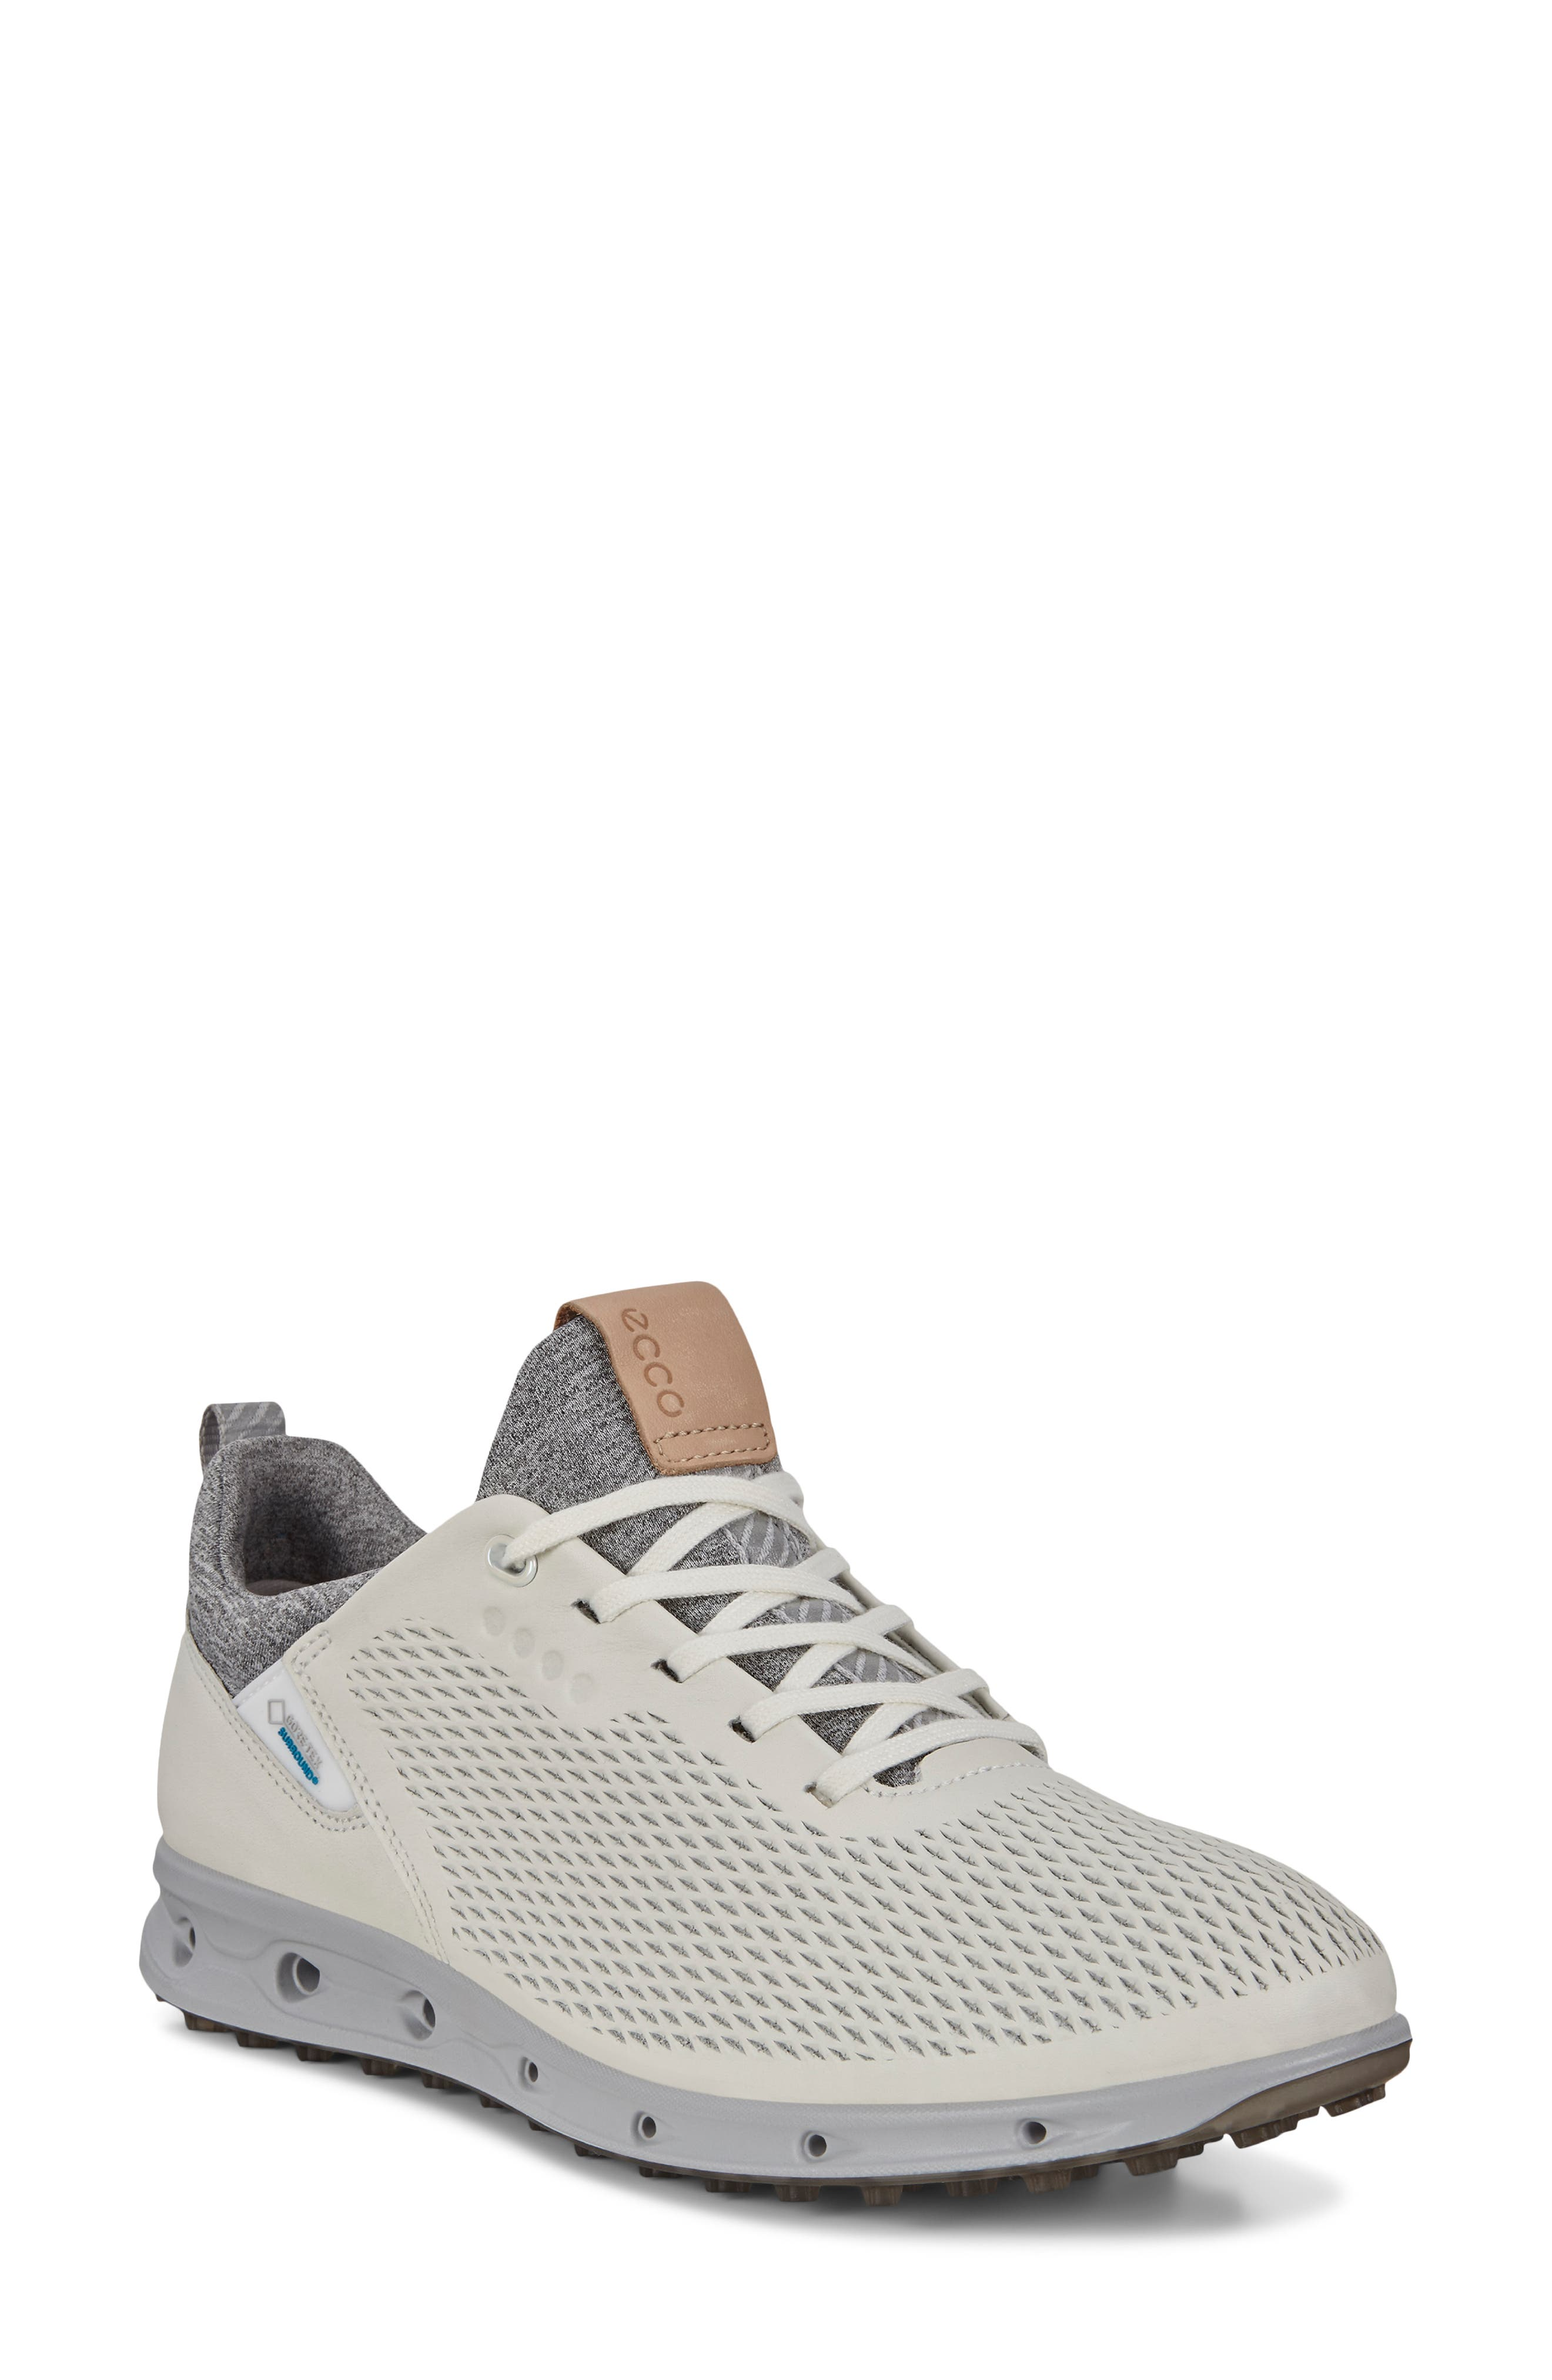 Women's Ecco Cool Pro Waterproof Golf Shoe